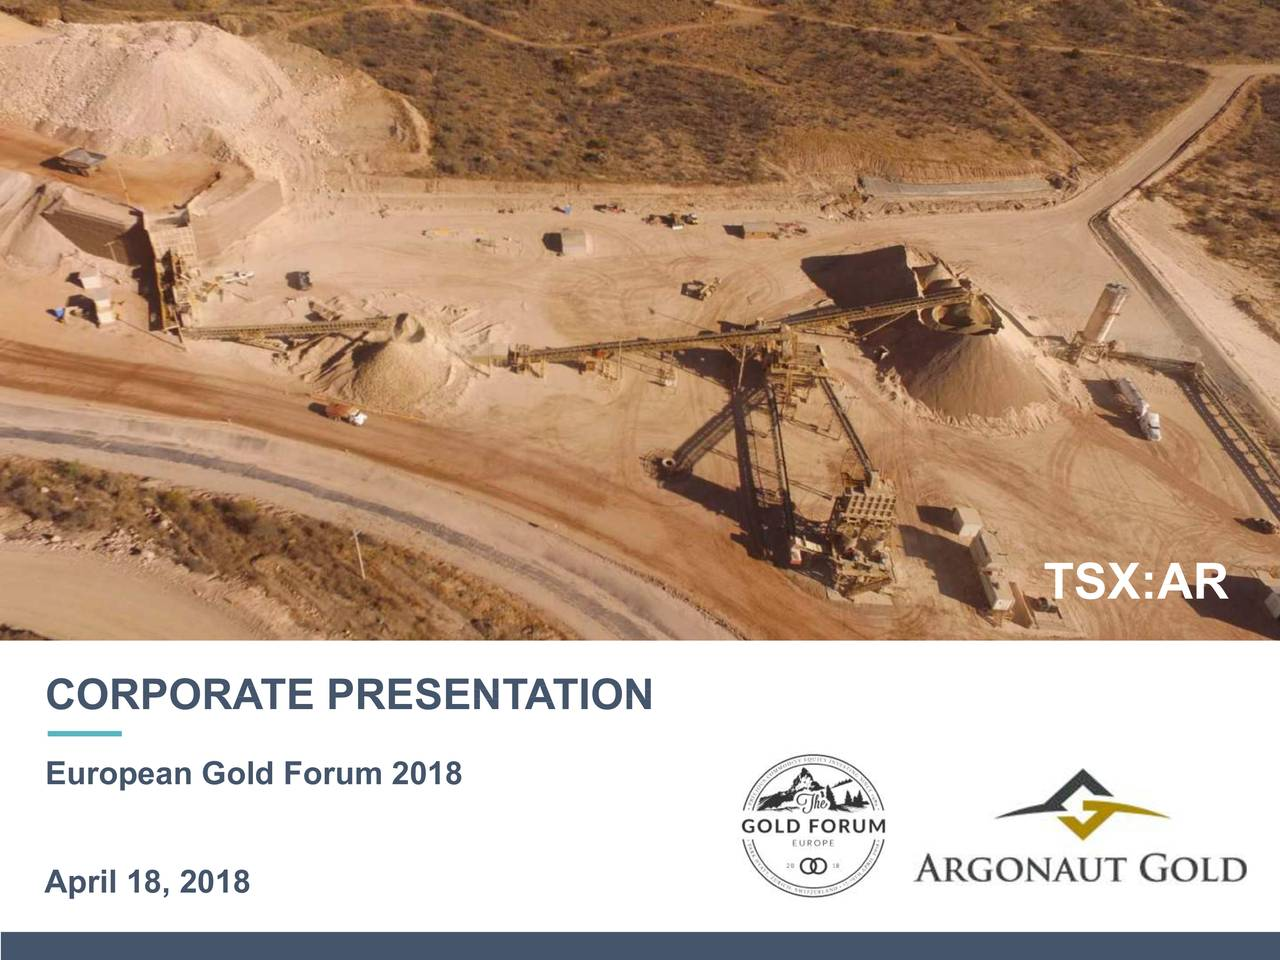 Argonaut Gold (ARNGF) Presents At European Gold Forum